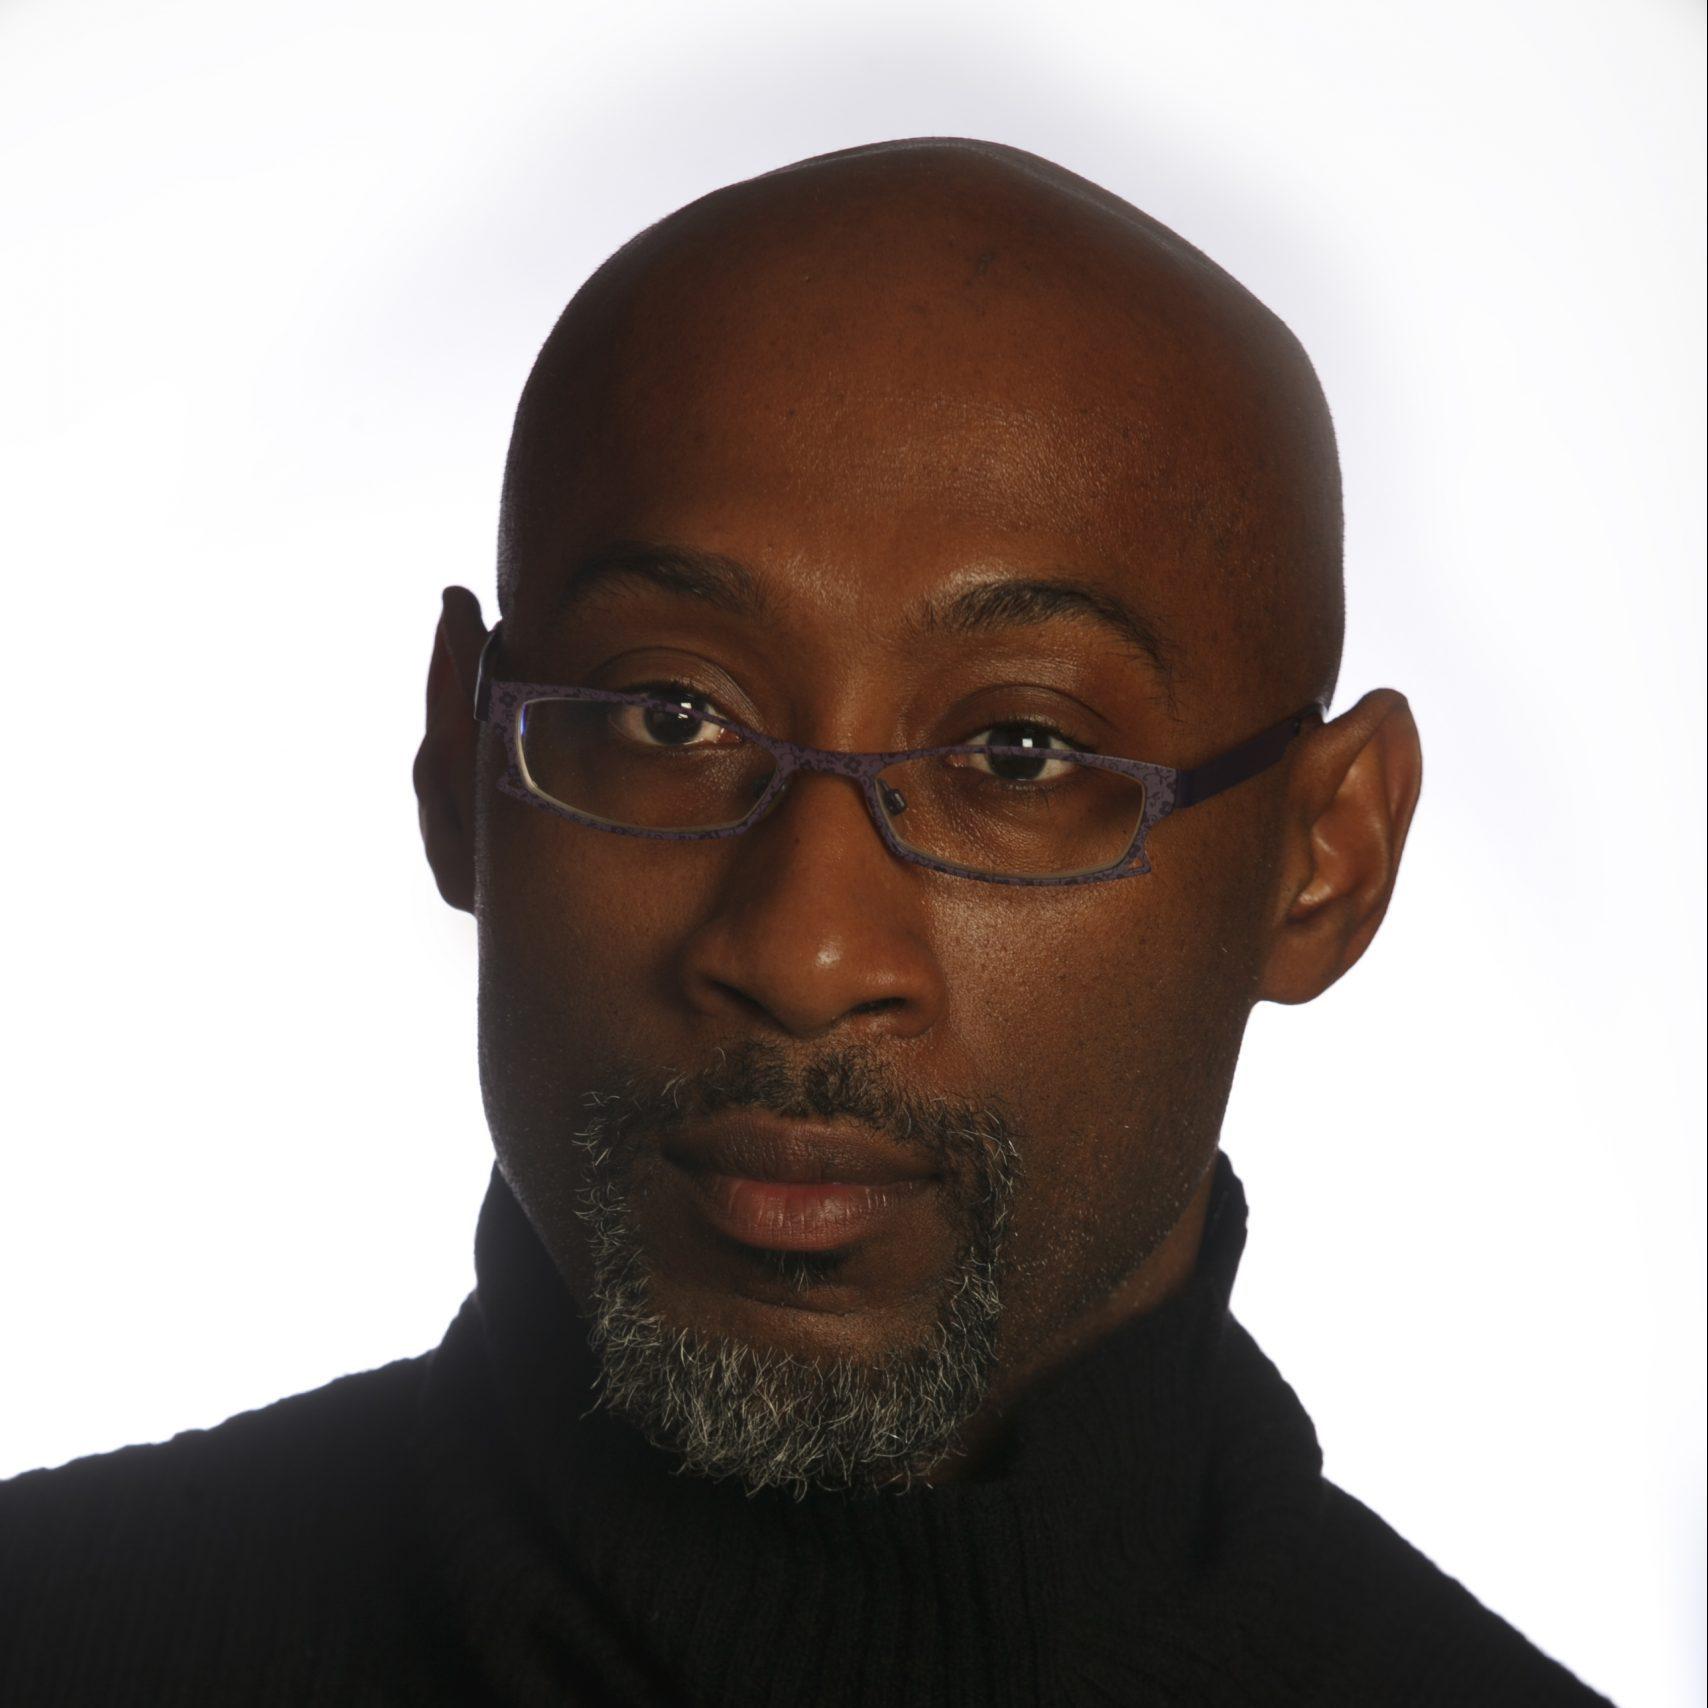 Dr. Tony Burks